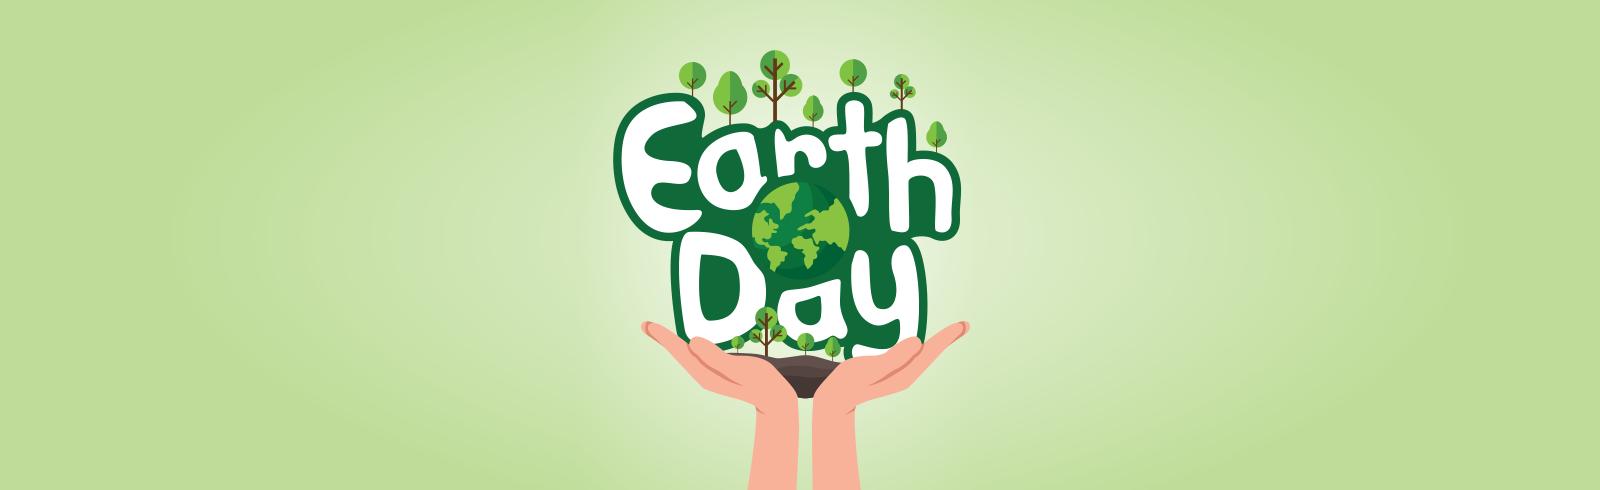 Earth Day Logo Design Contest 2019.